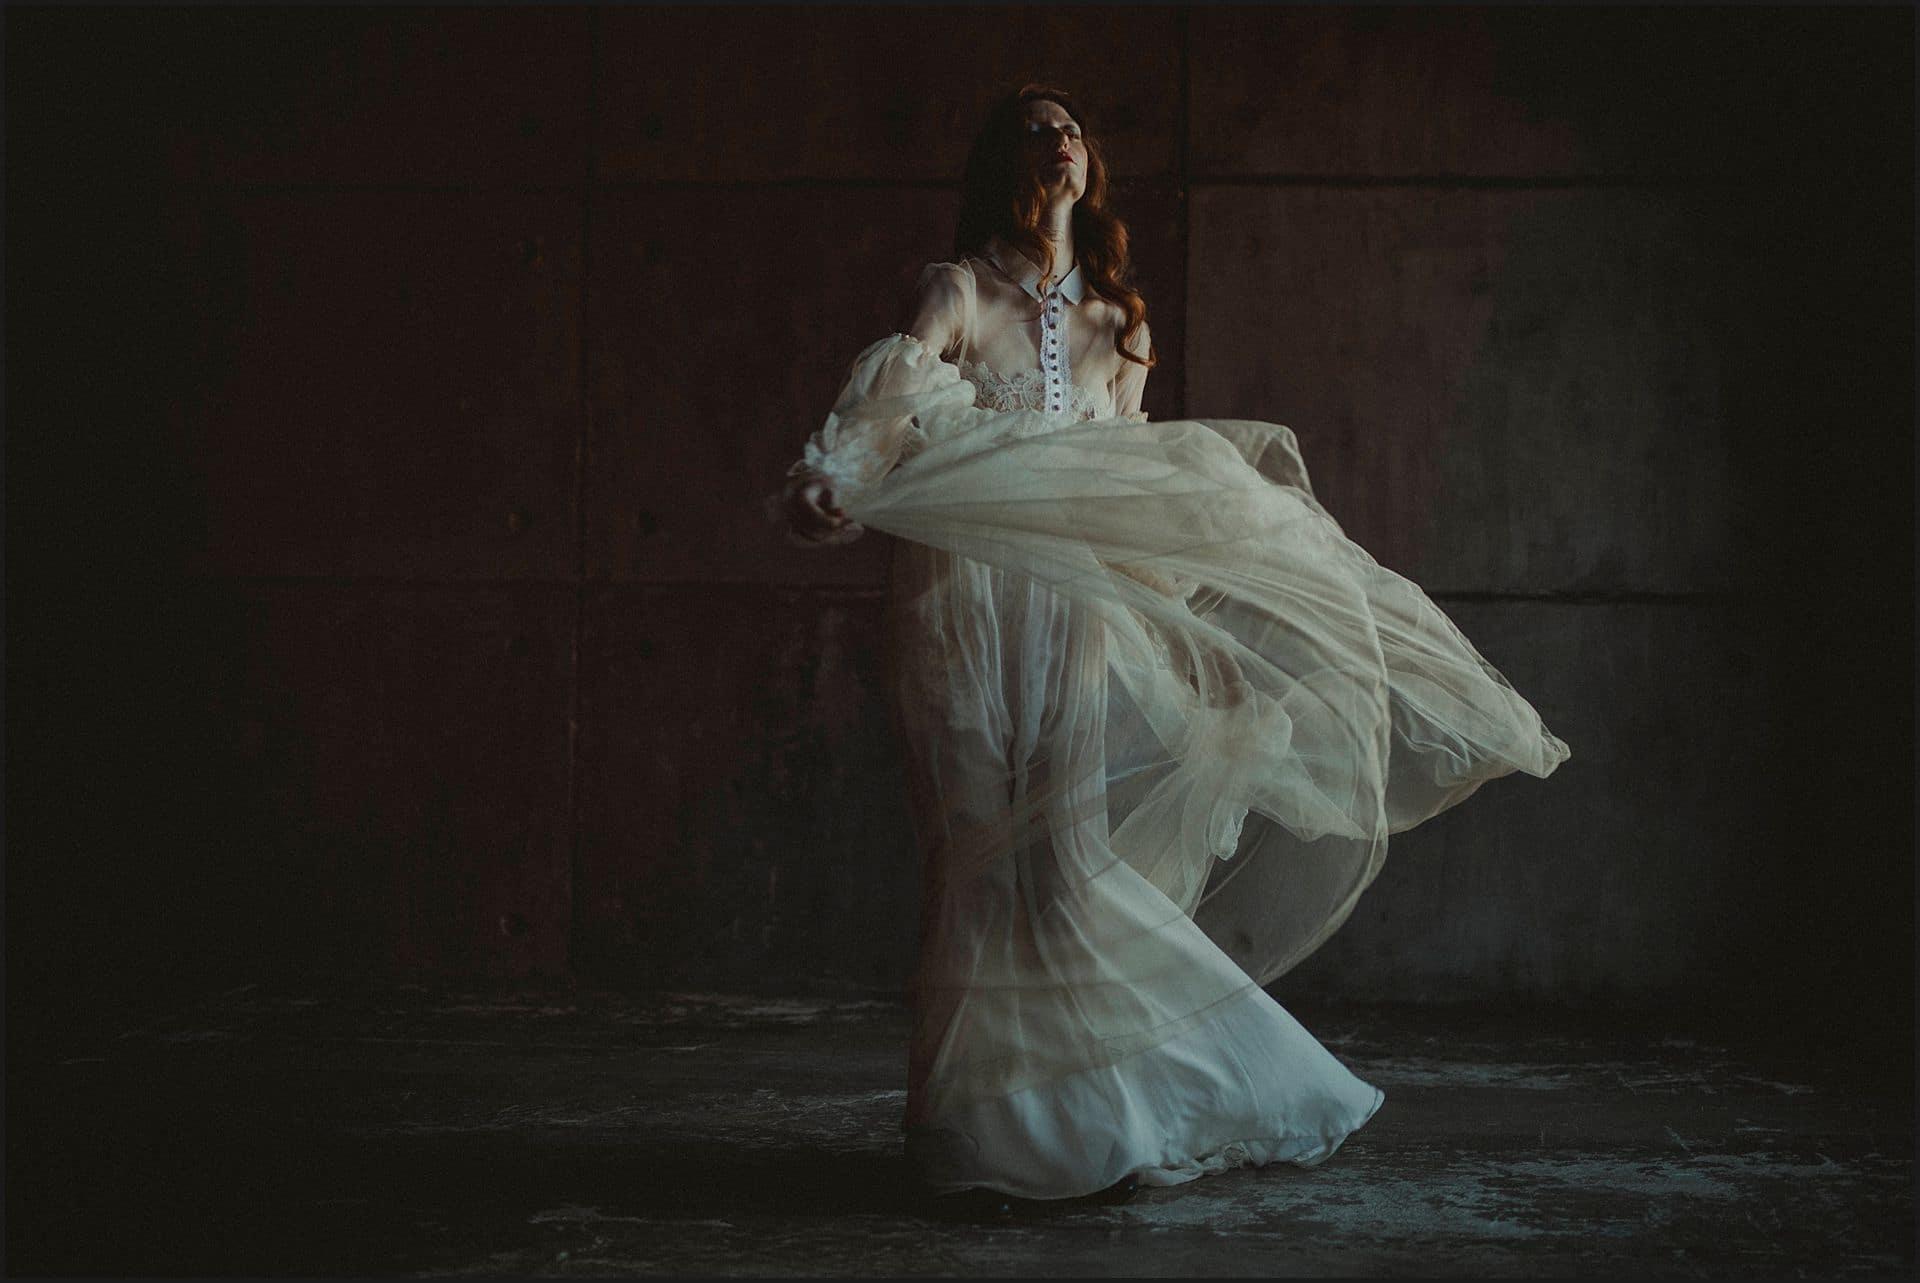 wedding dress, bride portrunconventional wedding, cross studio, milan, wedding photographer, wedding in italy